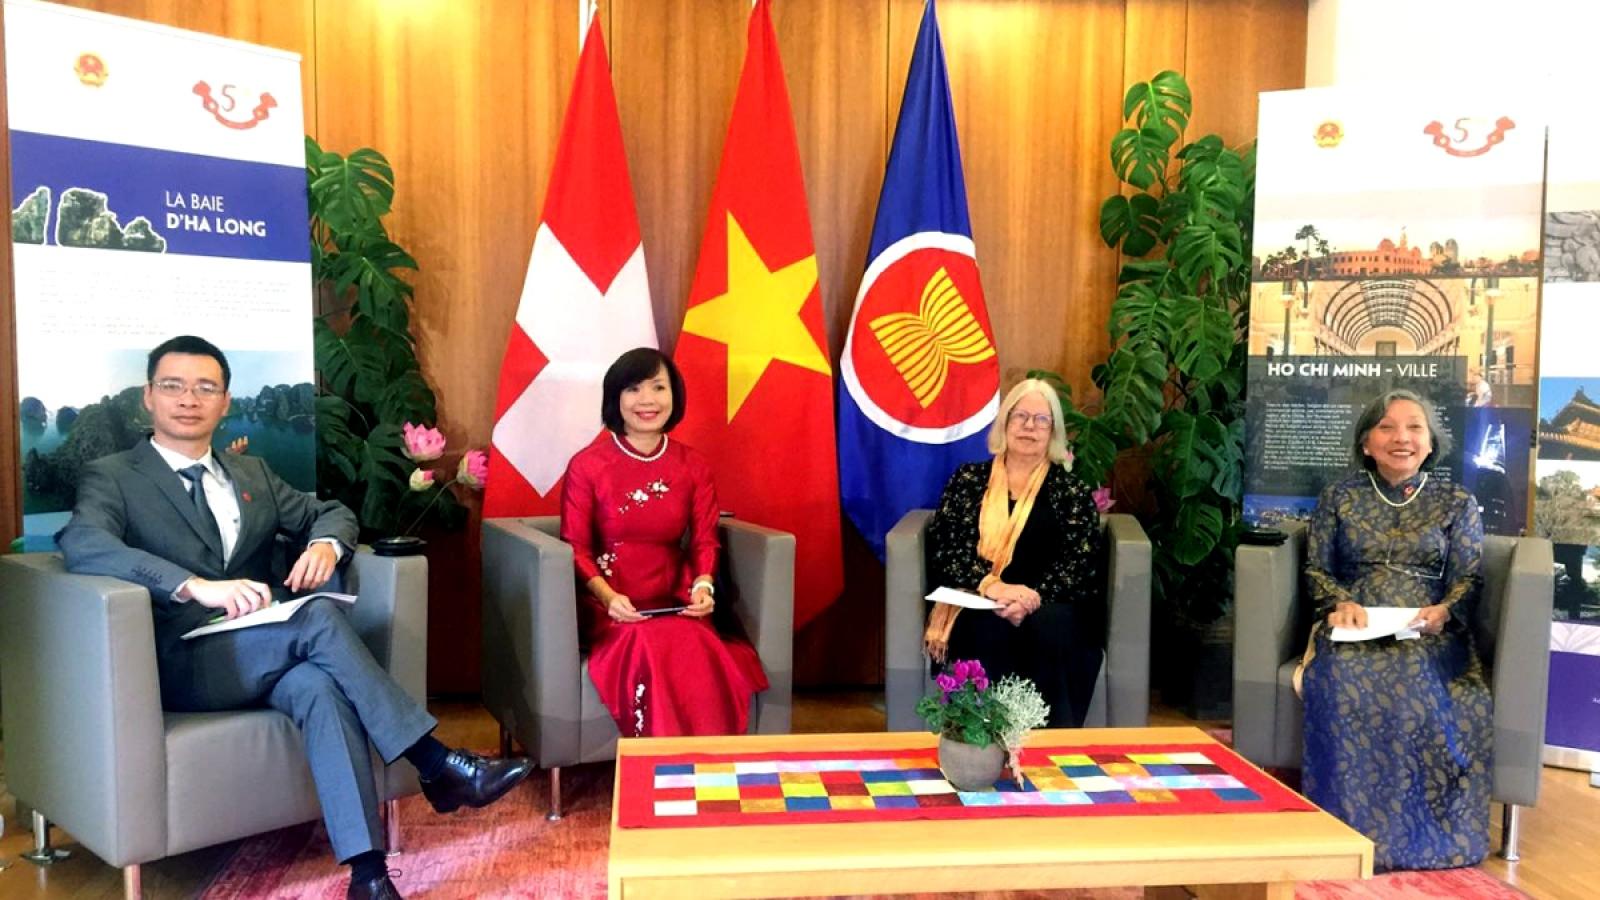 Vietnam Day in Switzerland 2021 promotes bilateral relations